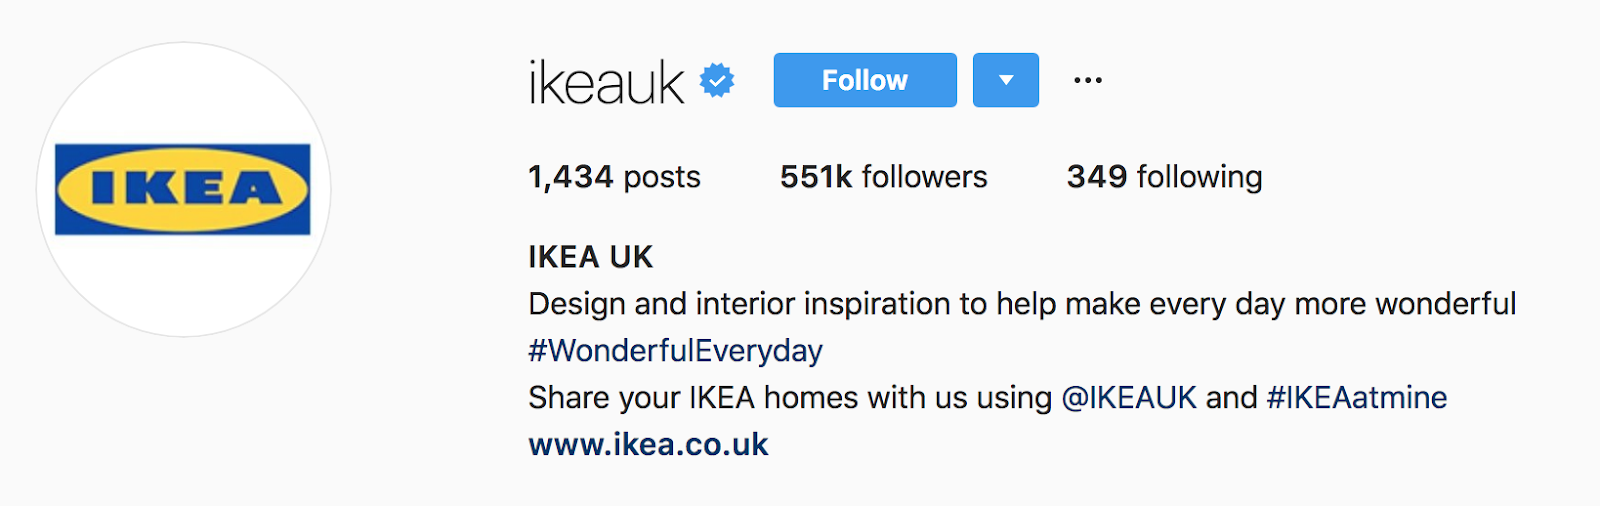 ikea profile page